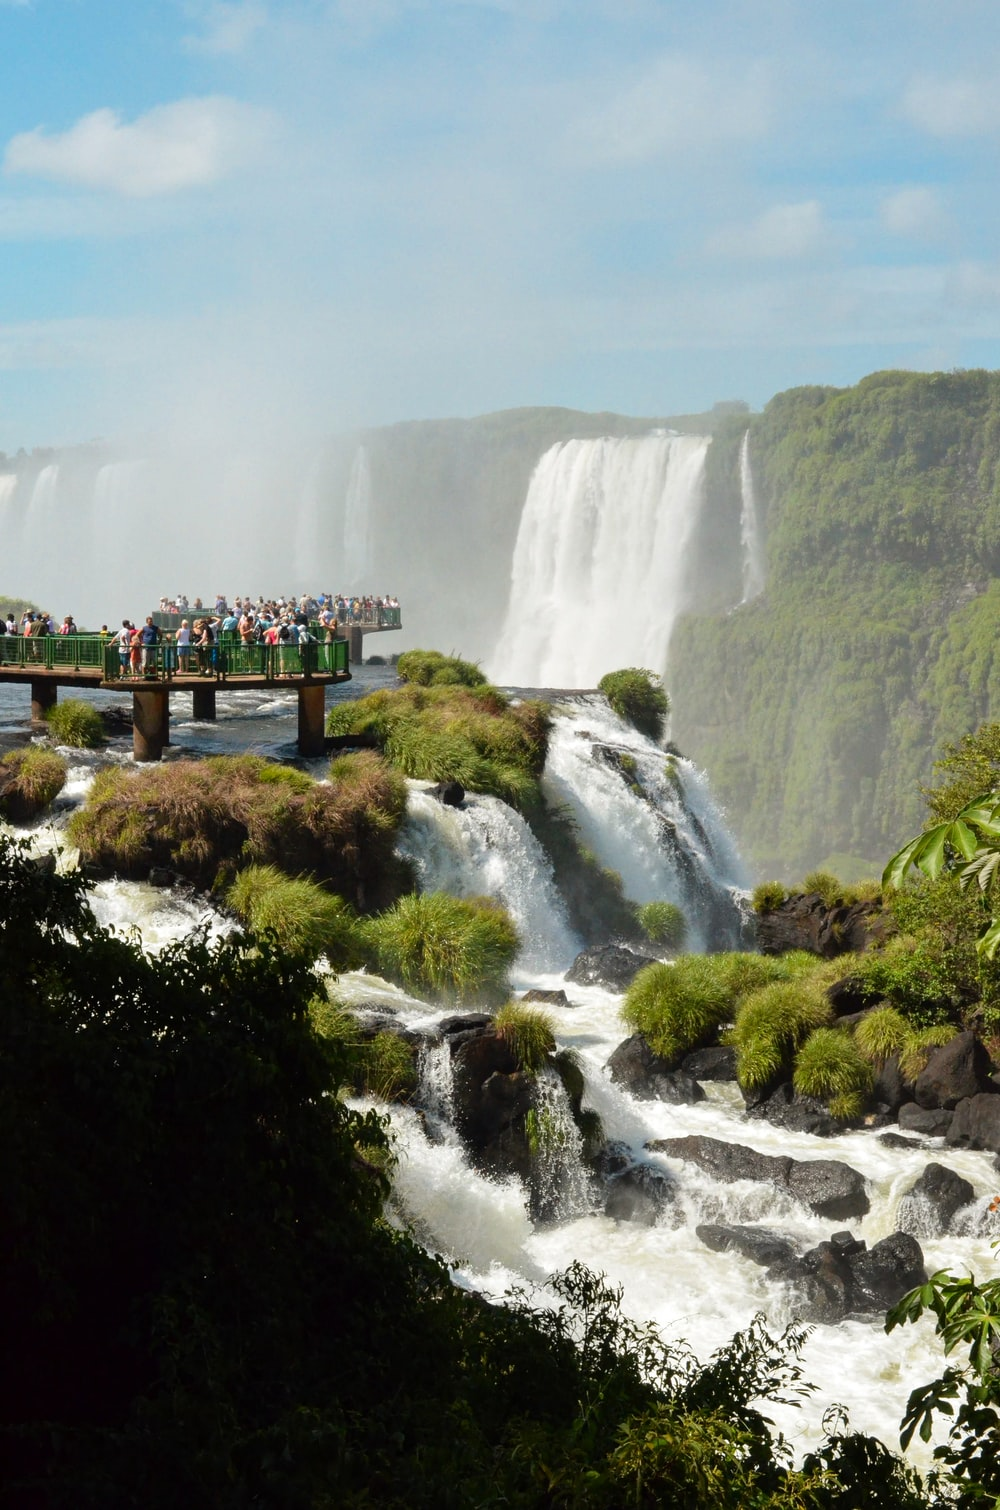 people standing on wooden bridge over waterfalls during daytime